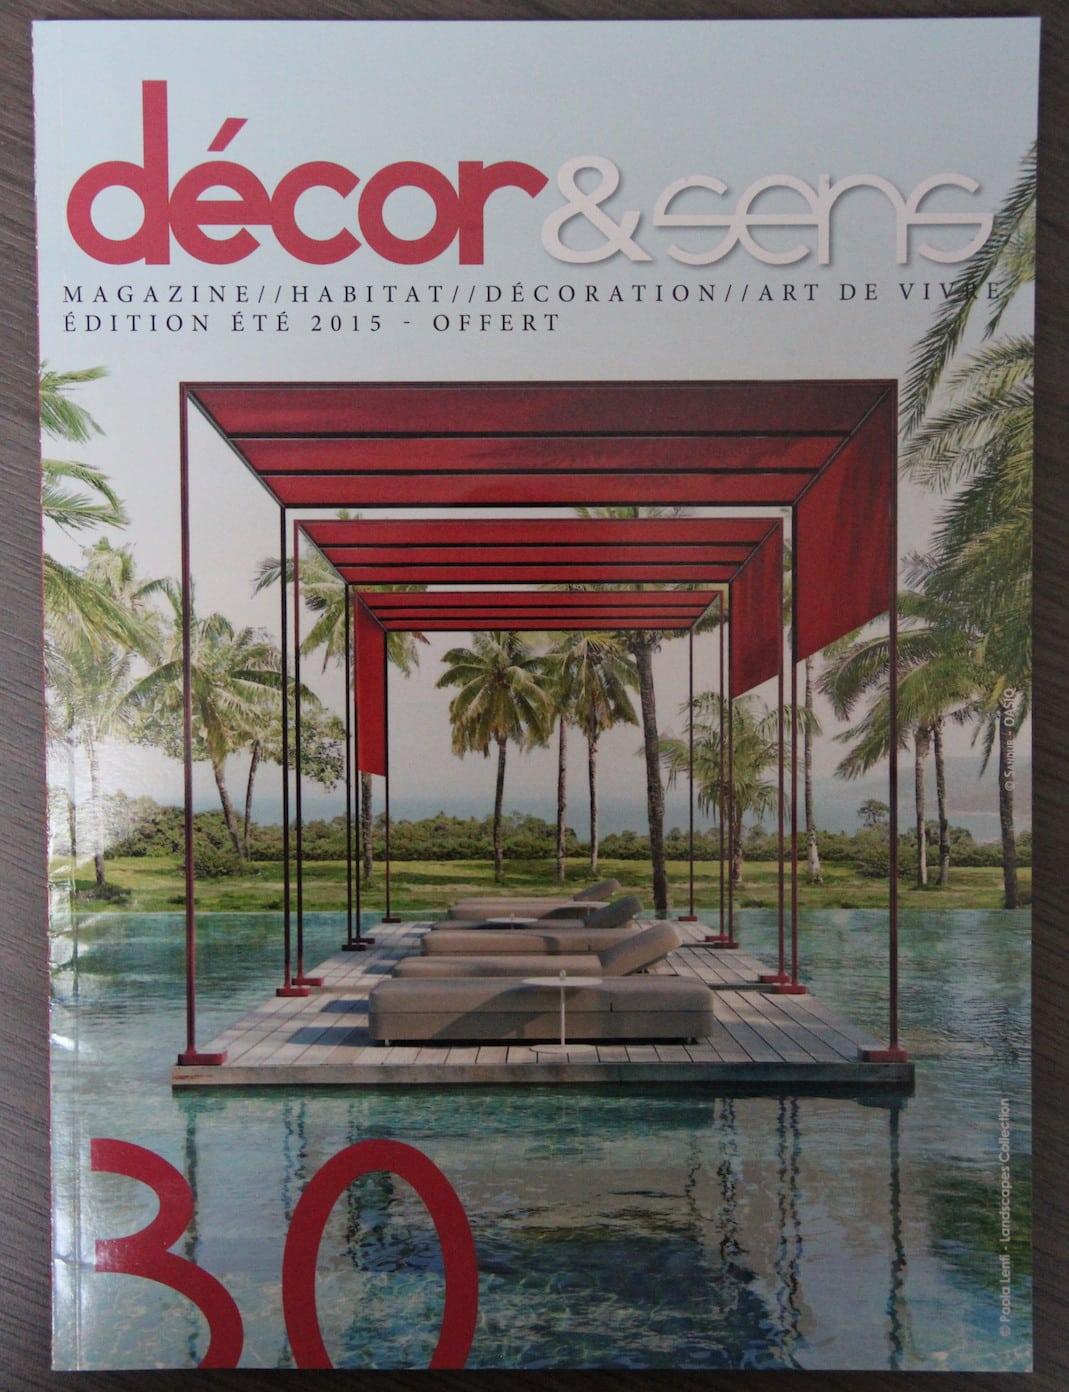 décor & sens magazine